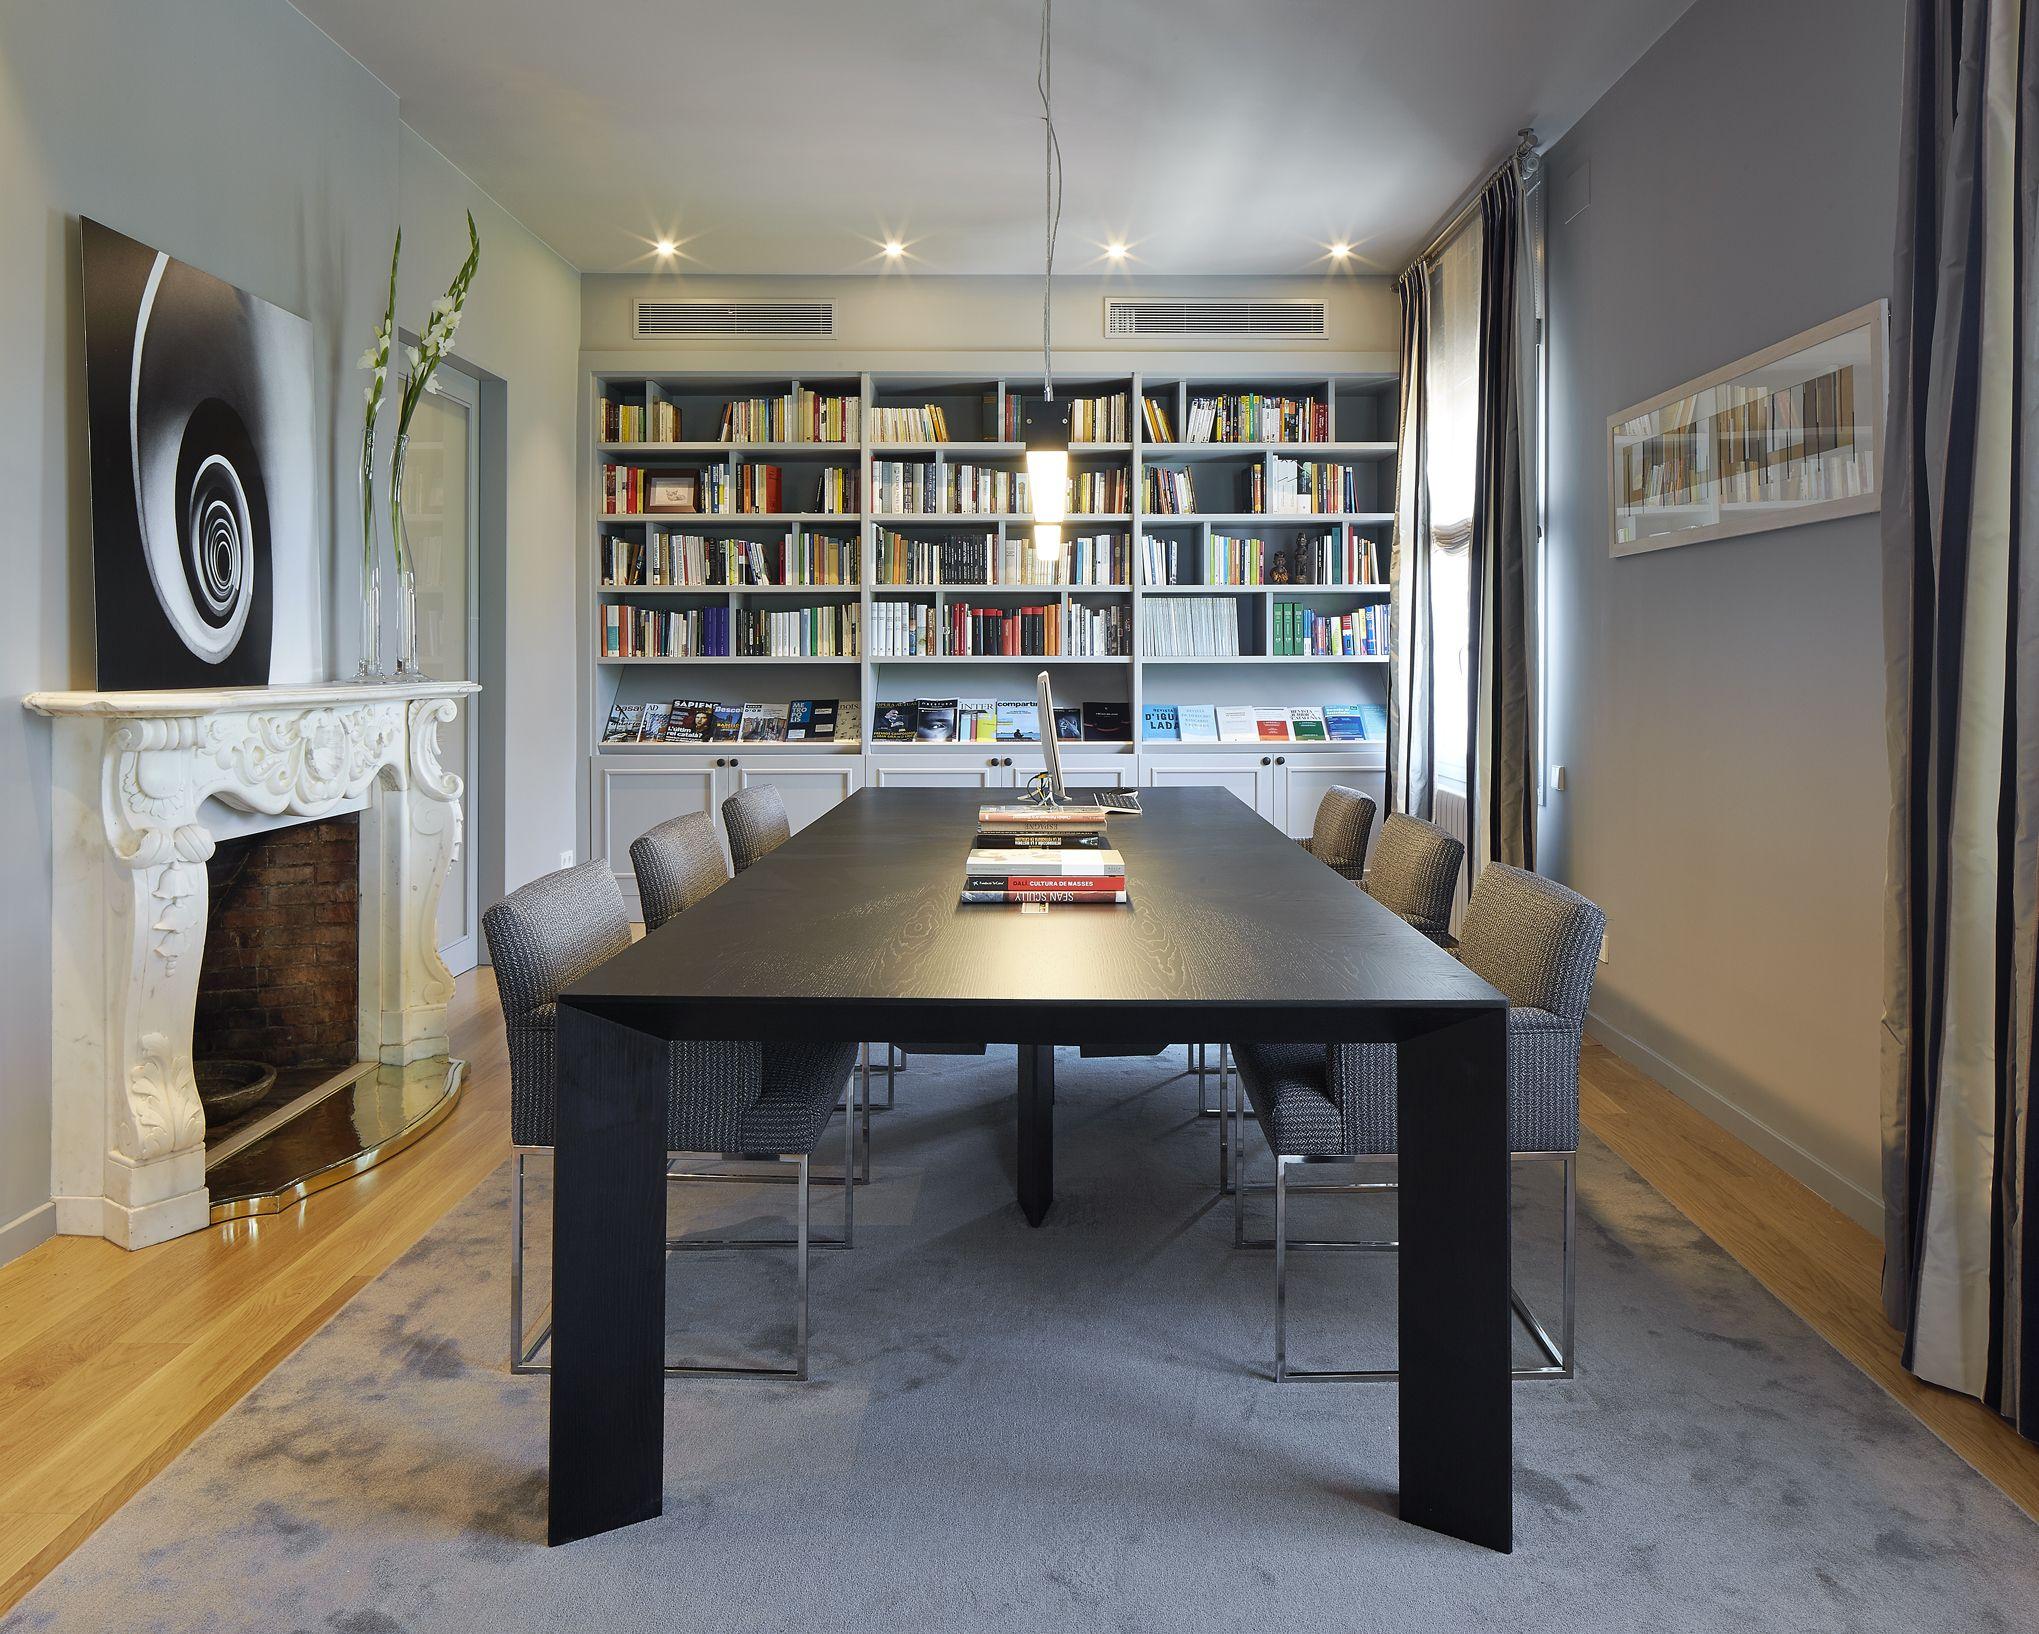 Molins interiors arquitectura interior interiorismo decoraci n biblioteca sala de - Mesas de arquitectura ...